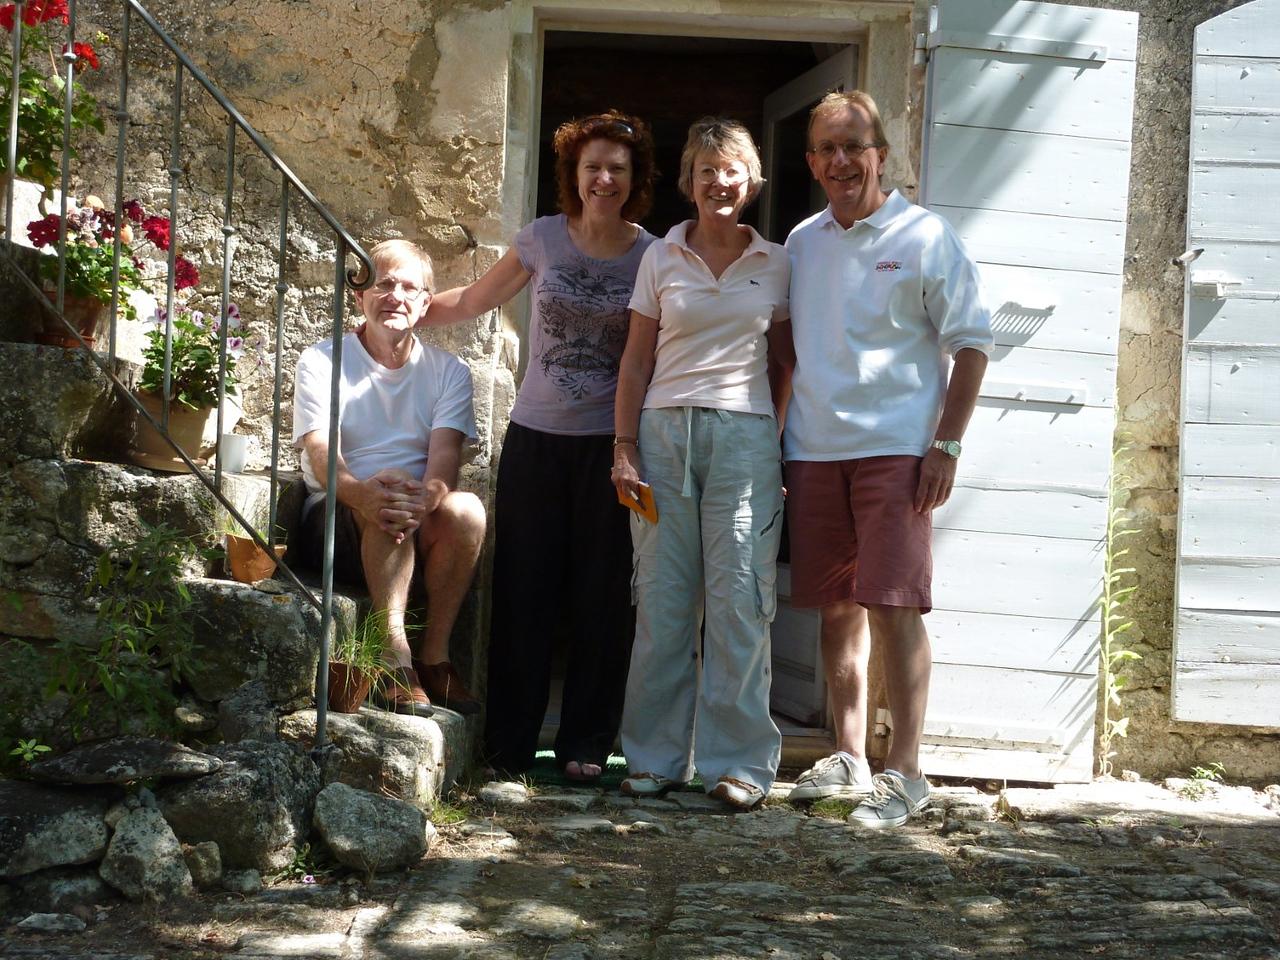 Alan, Tracey, Sheryl and Michael